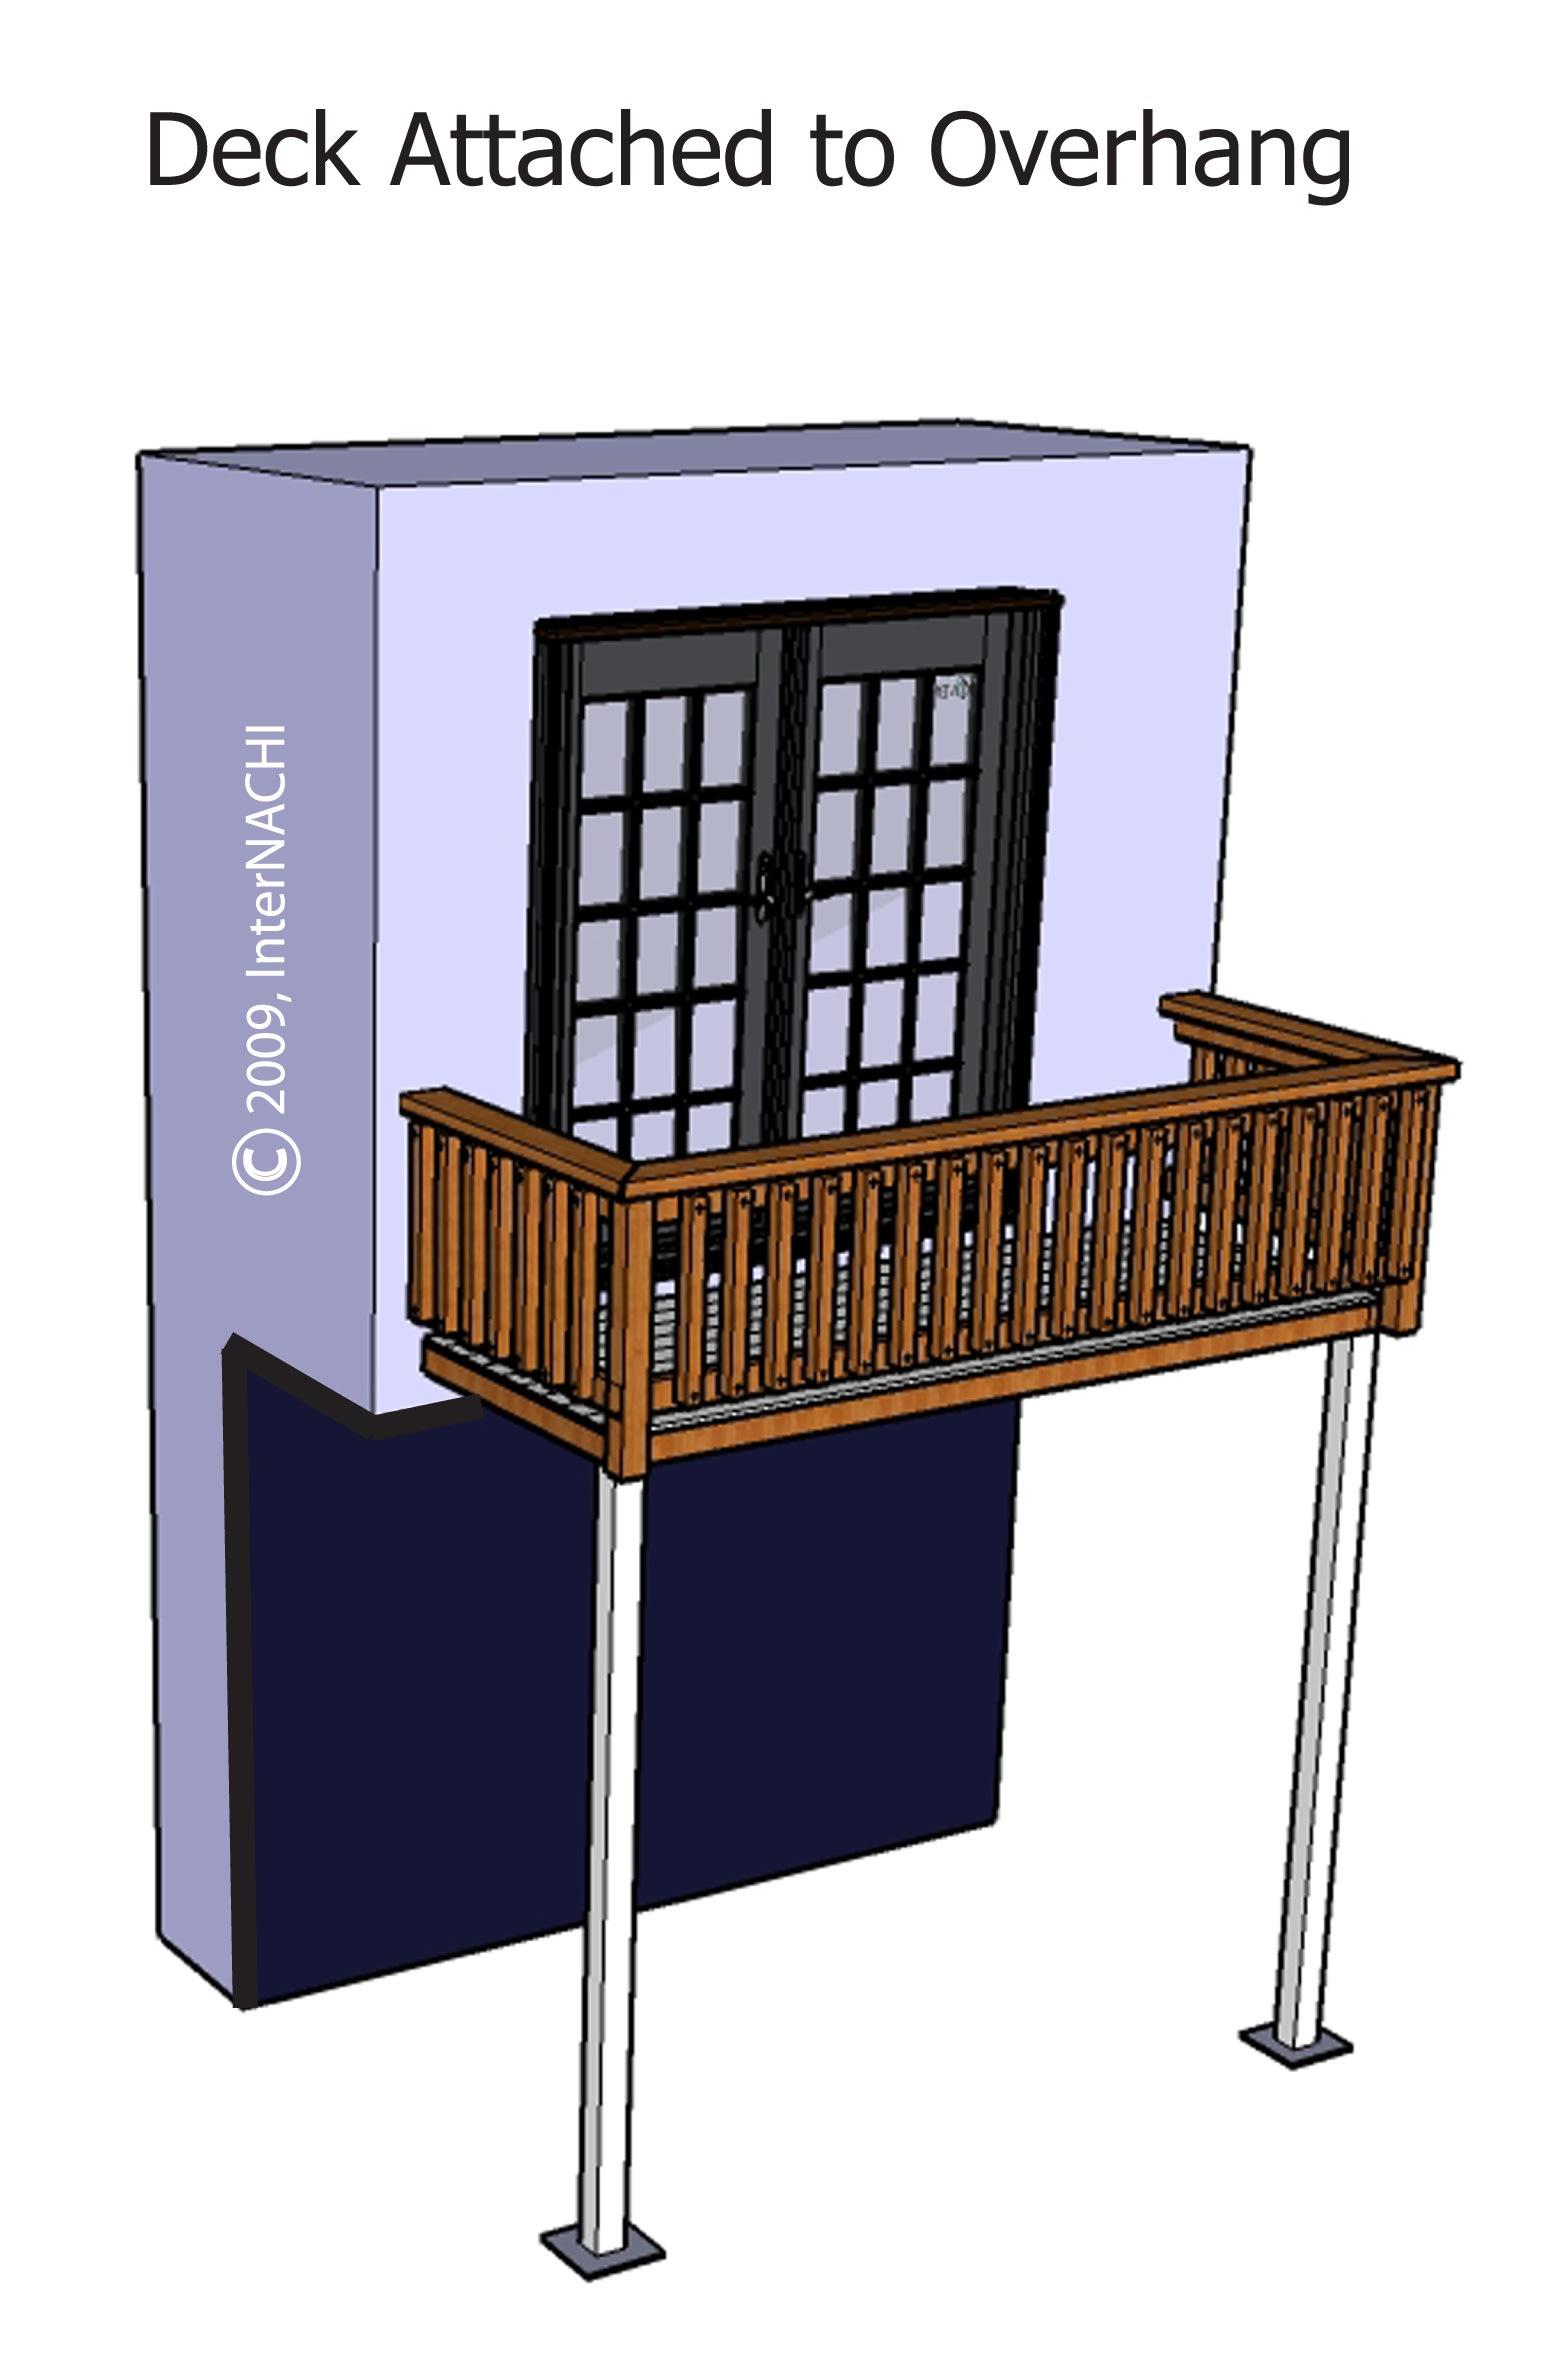 Deck attached to overhang (improper).